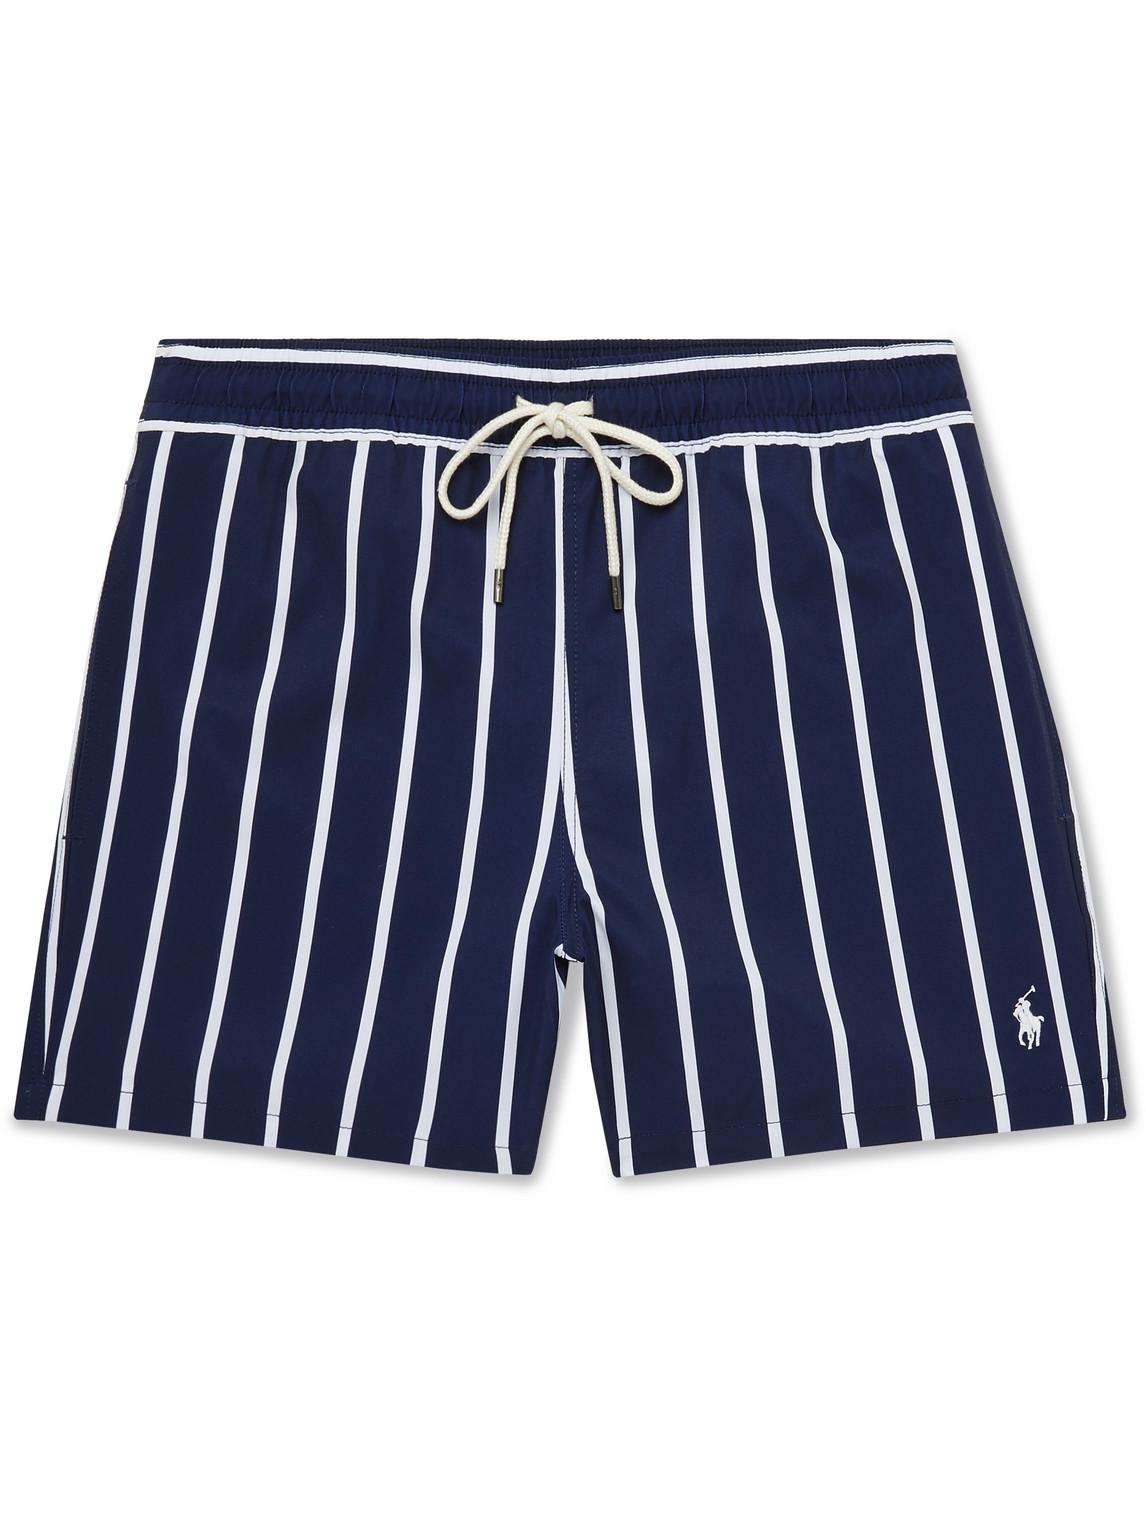 Polo Ralph Lauren Beachwears STRIPED SWIM SHORTS